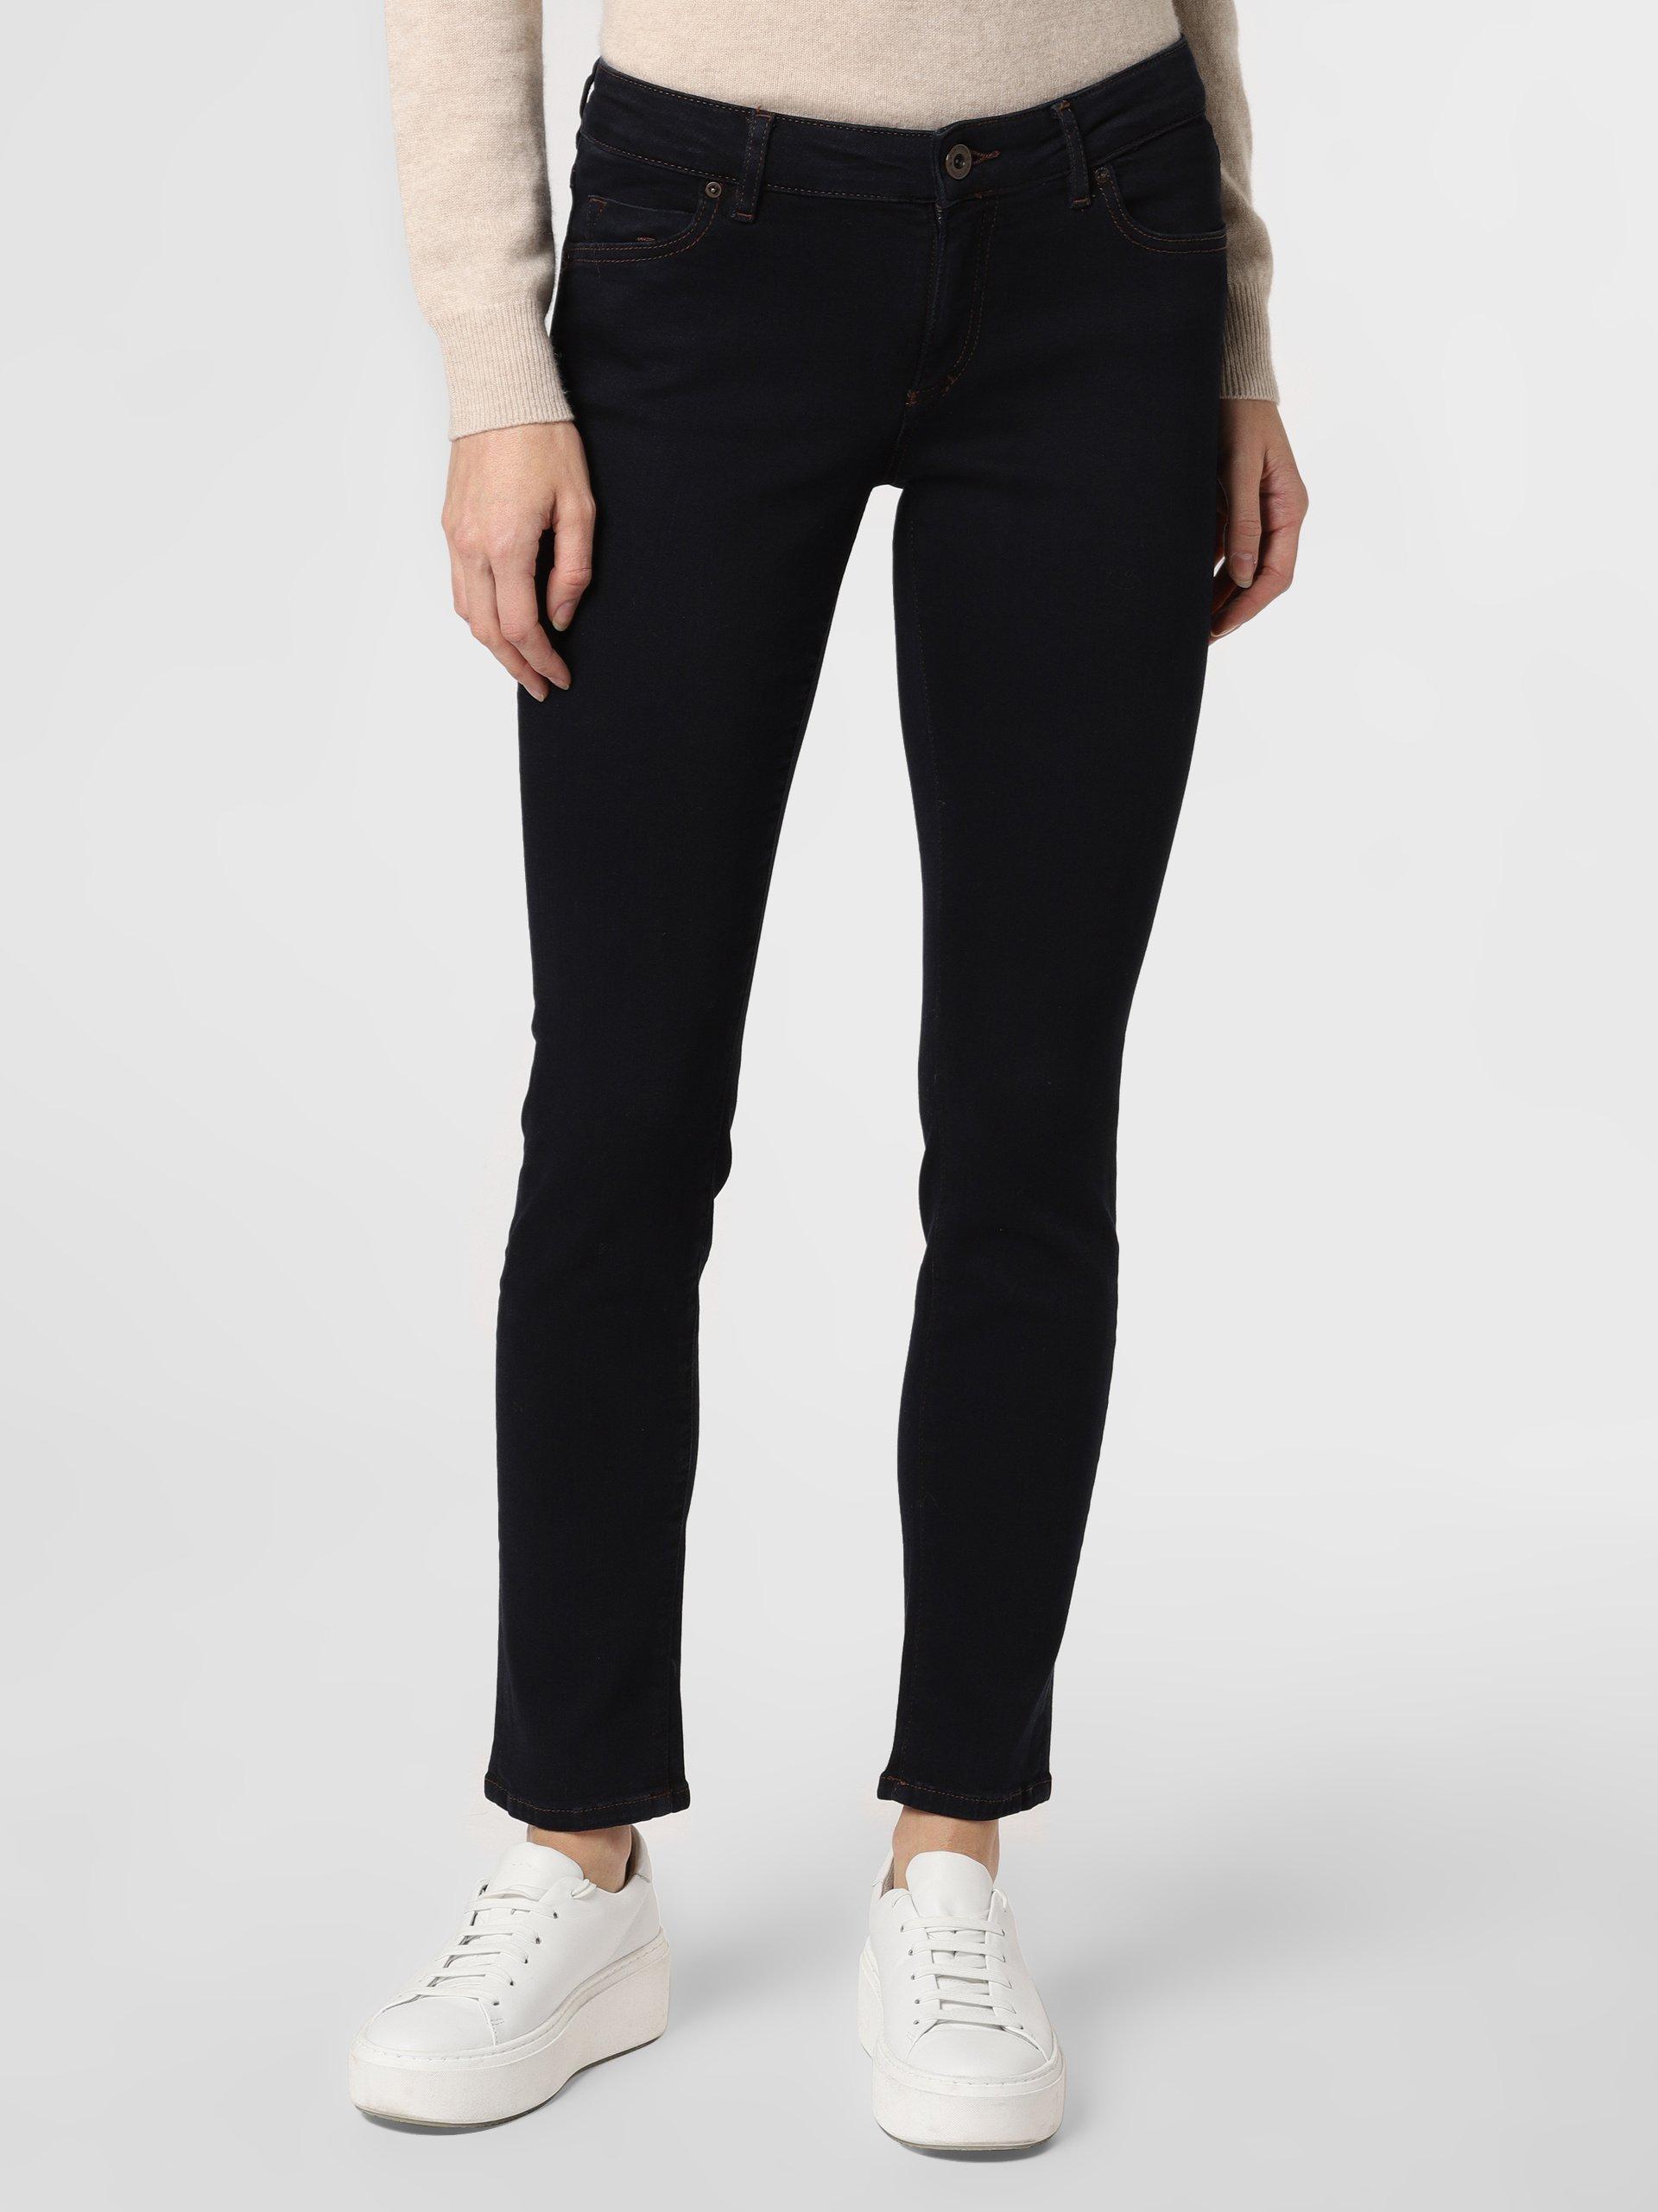 Marc O\'Polo Damen Jeans - Alby Slim